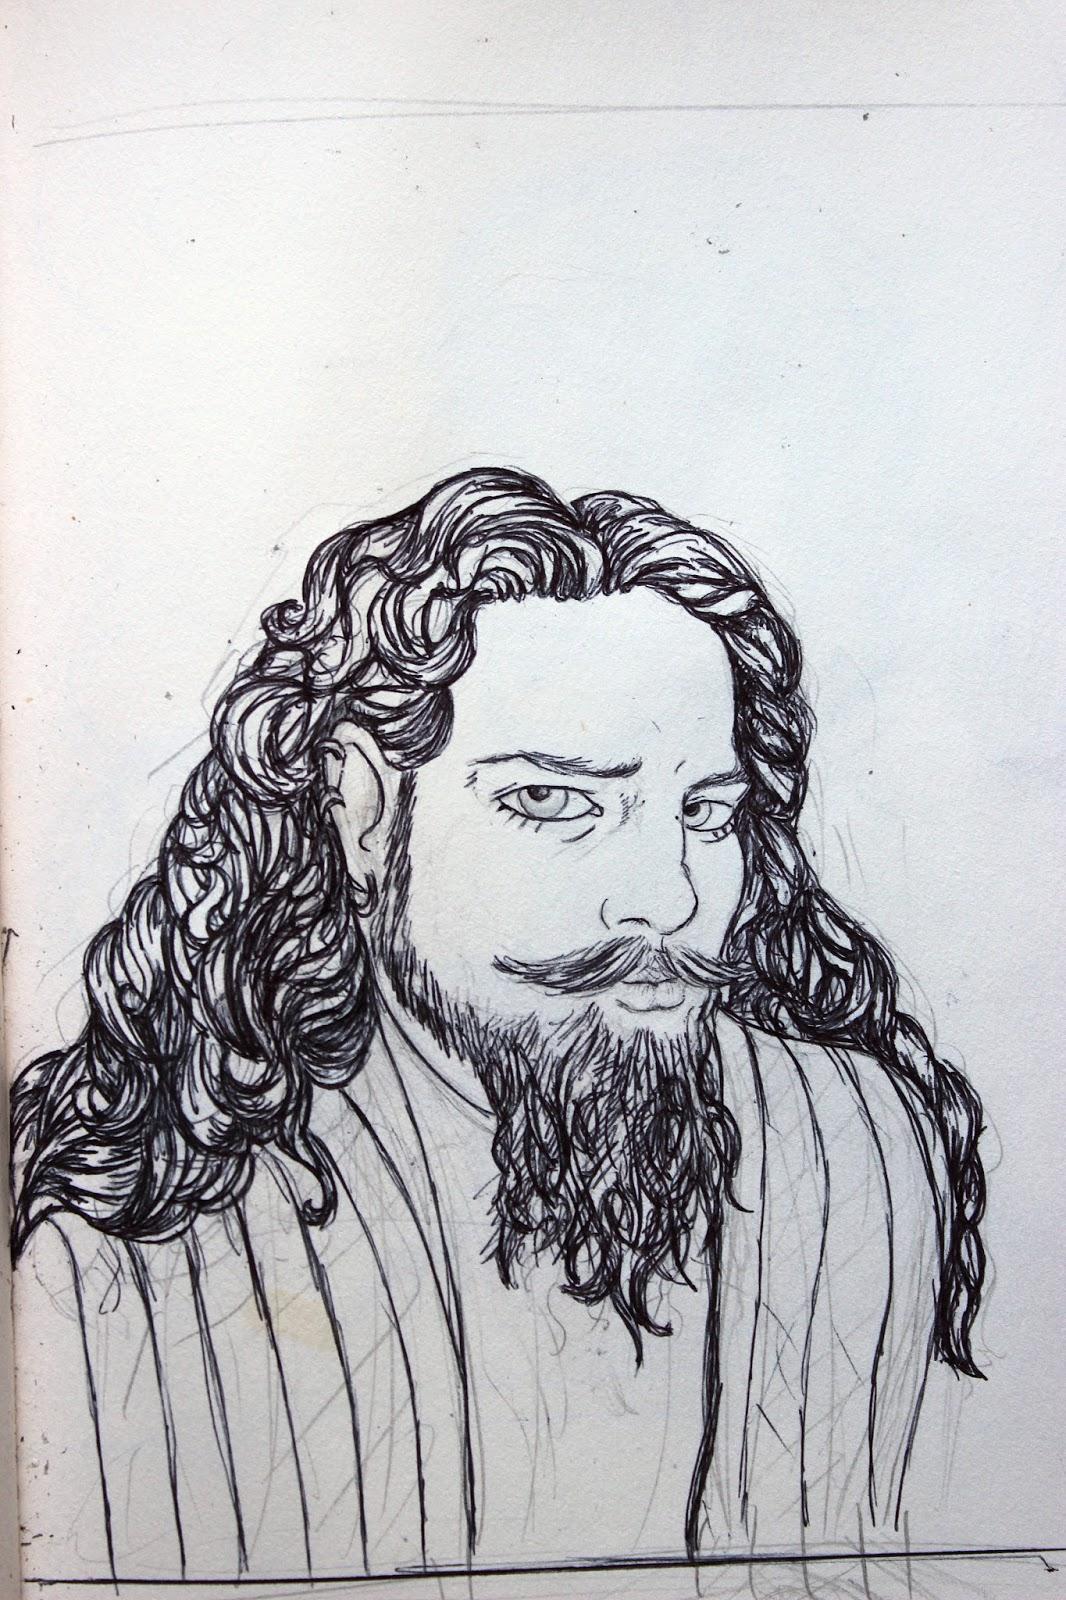 Sketchpad Notebook Sketch Drawing Pencil Portrait Pen Long Hair Beard